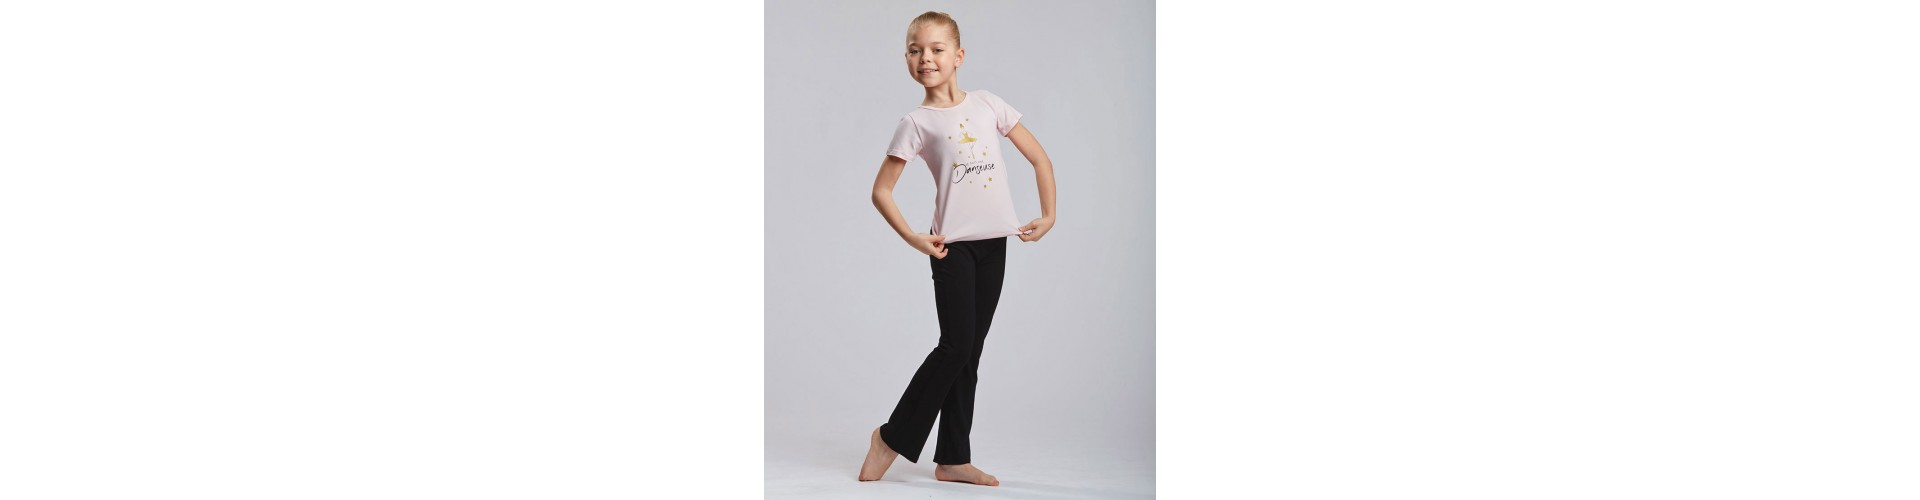 Pantalons de danse fille